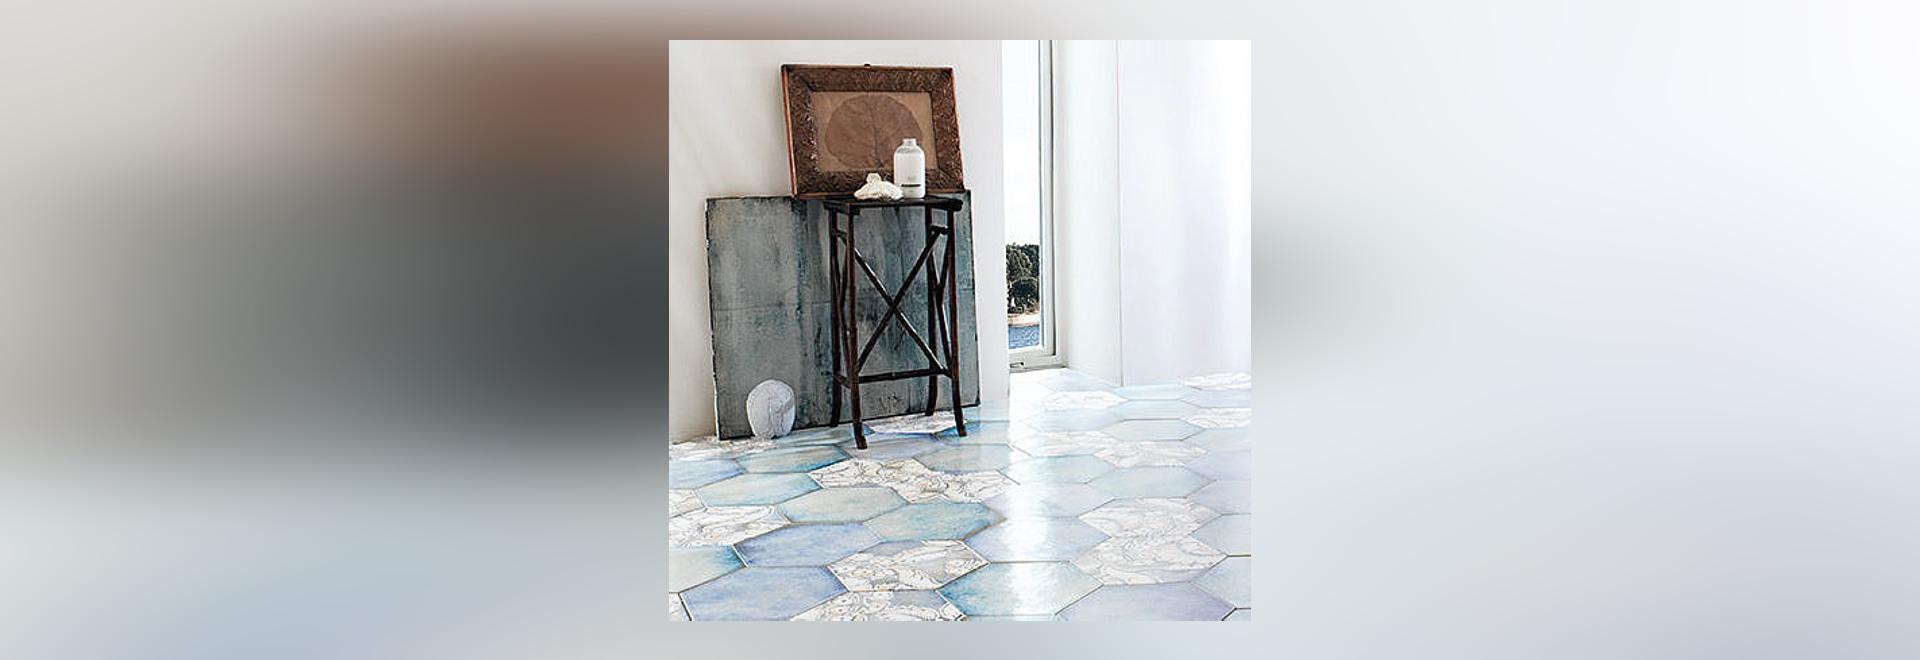 NEW: bathroom tile by Verso 25 - Verso 25